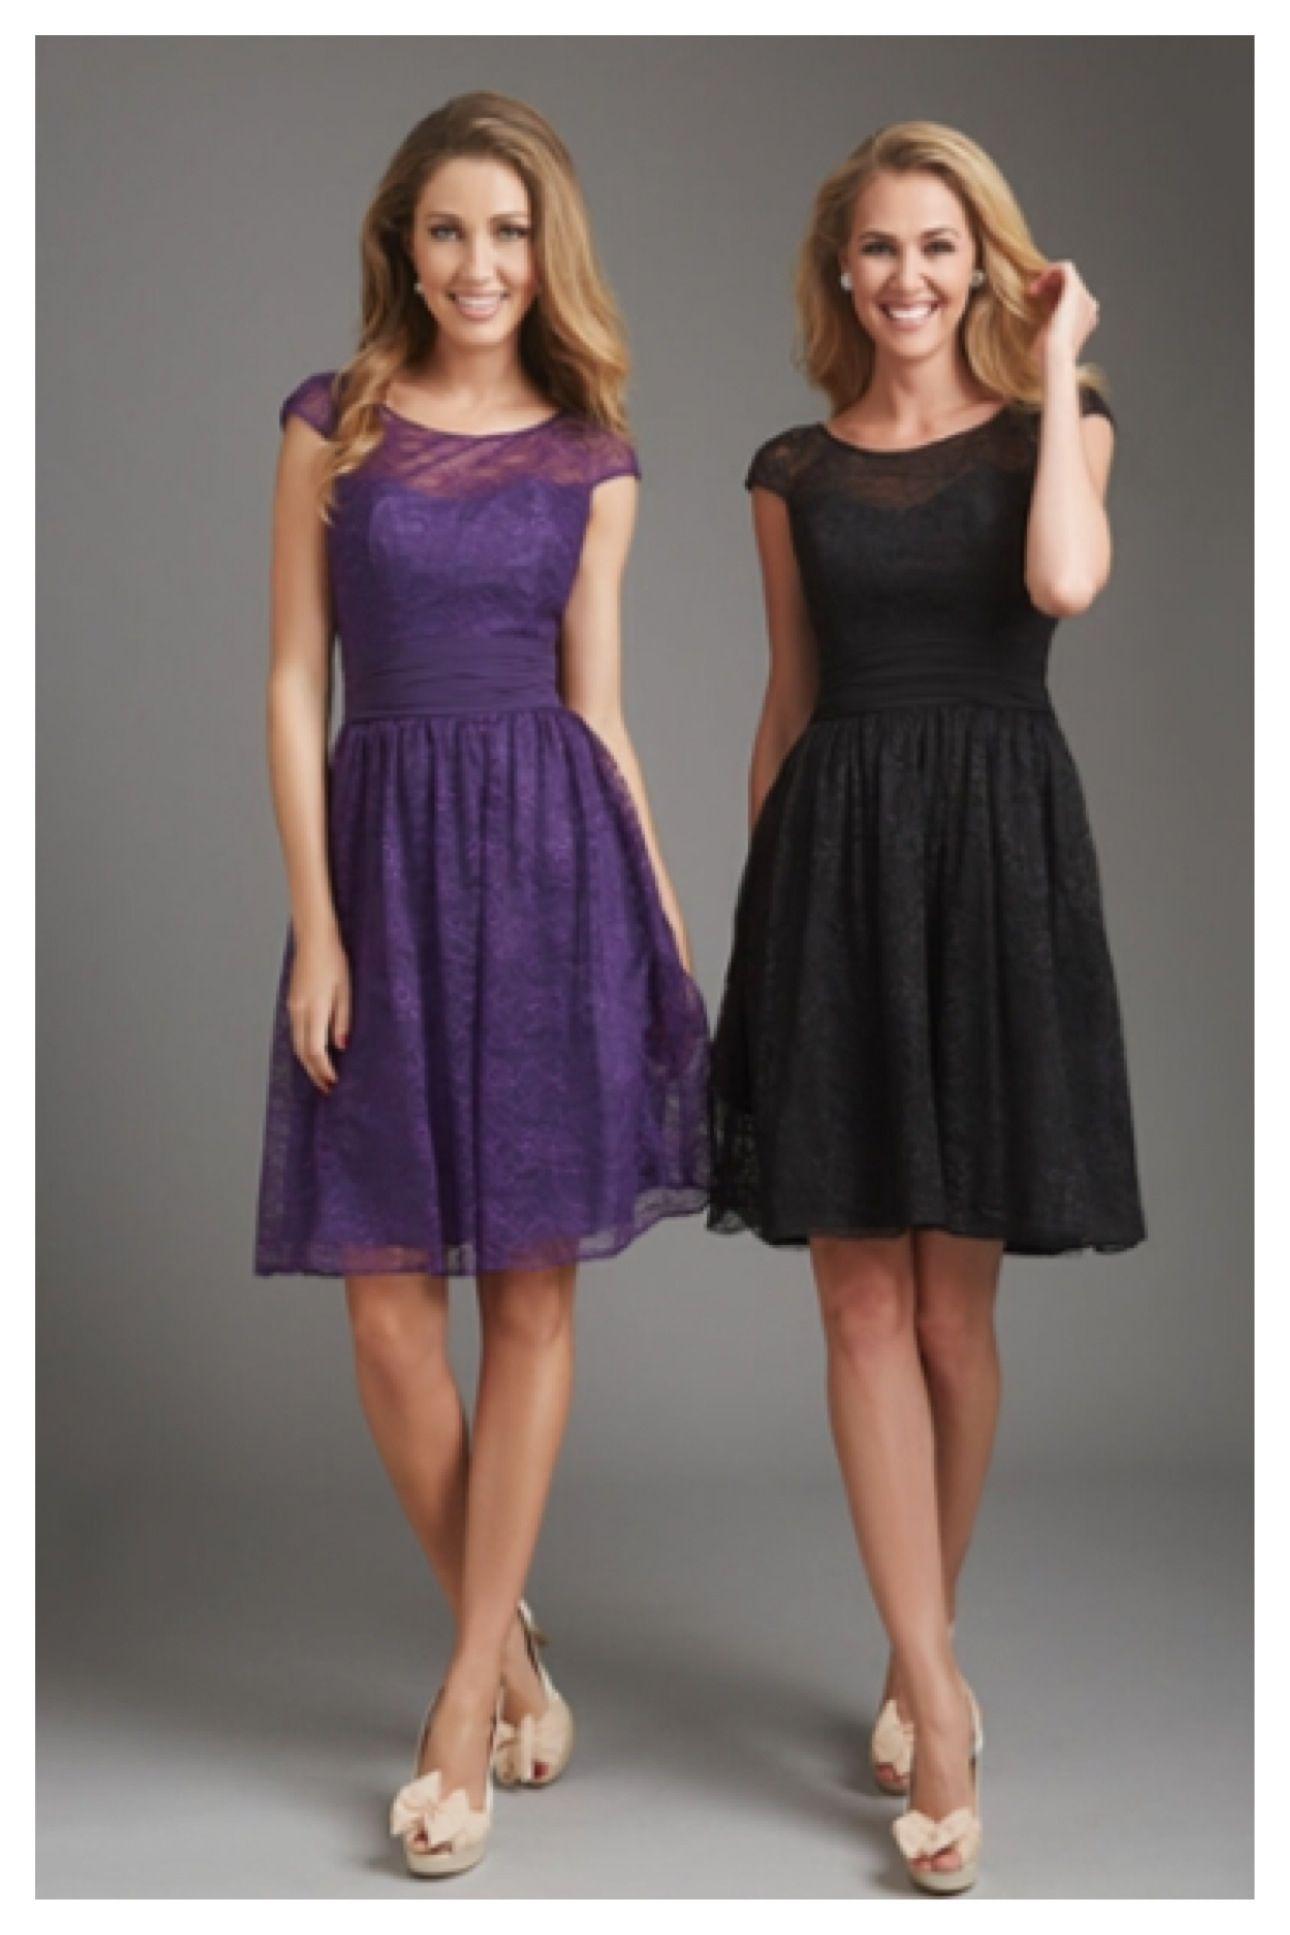 Lace/Chiffon   Bridesmaids & Mother\'s Gowns   Pinterest   Lace ...